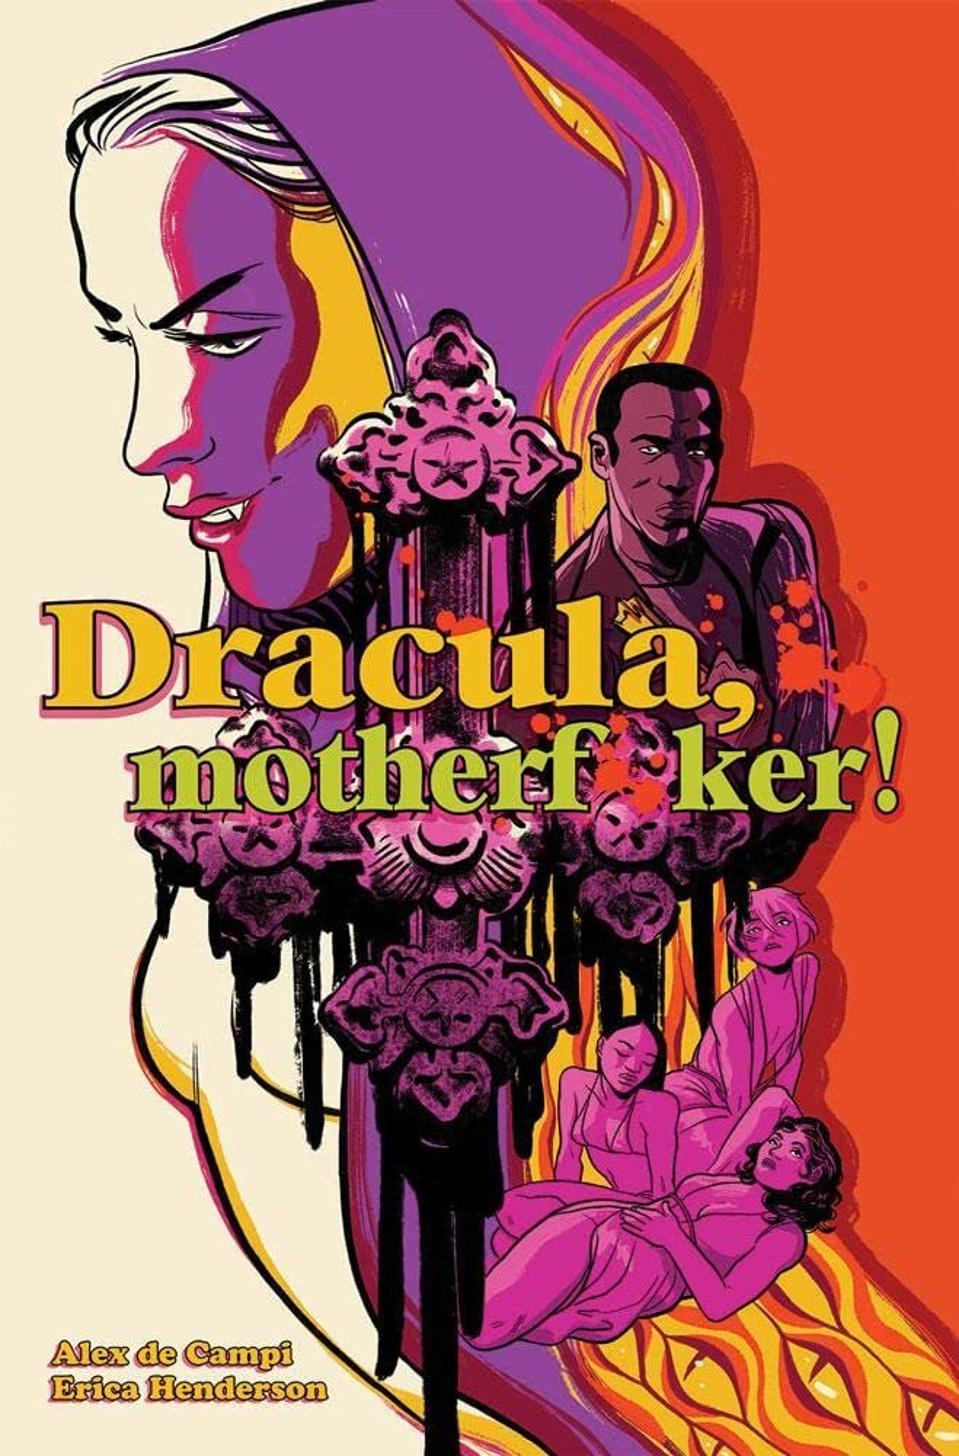 Dracula Motherf*ker de Campi Henderson Image comics horror graphic novel 1970s